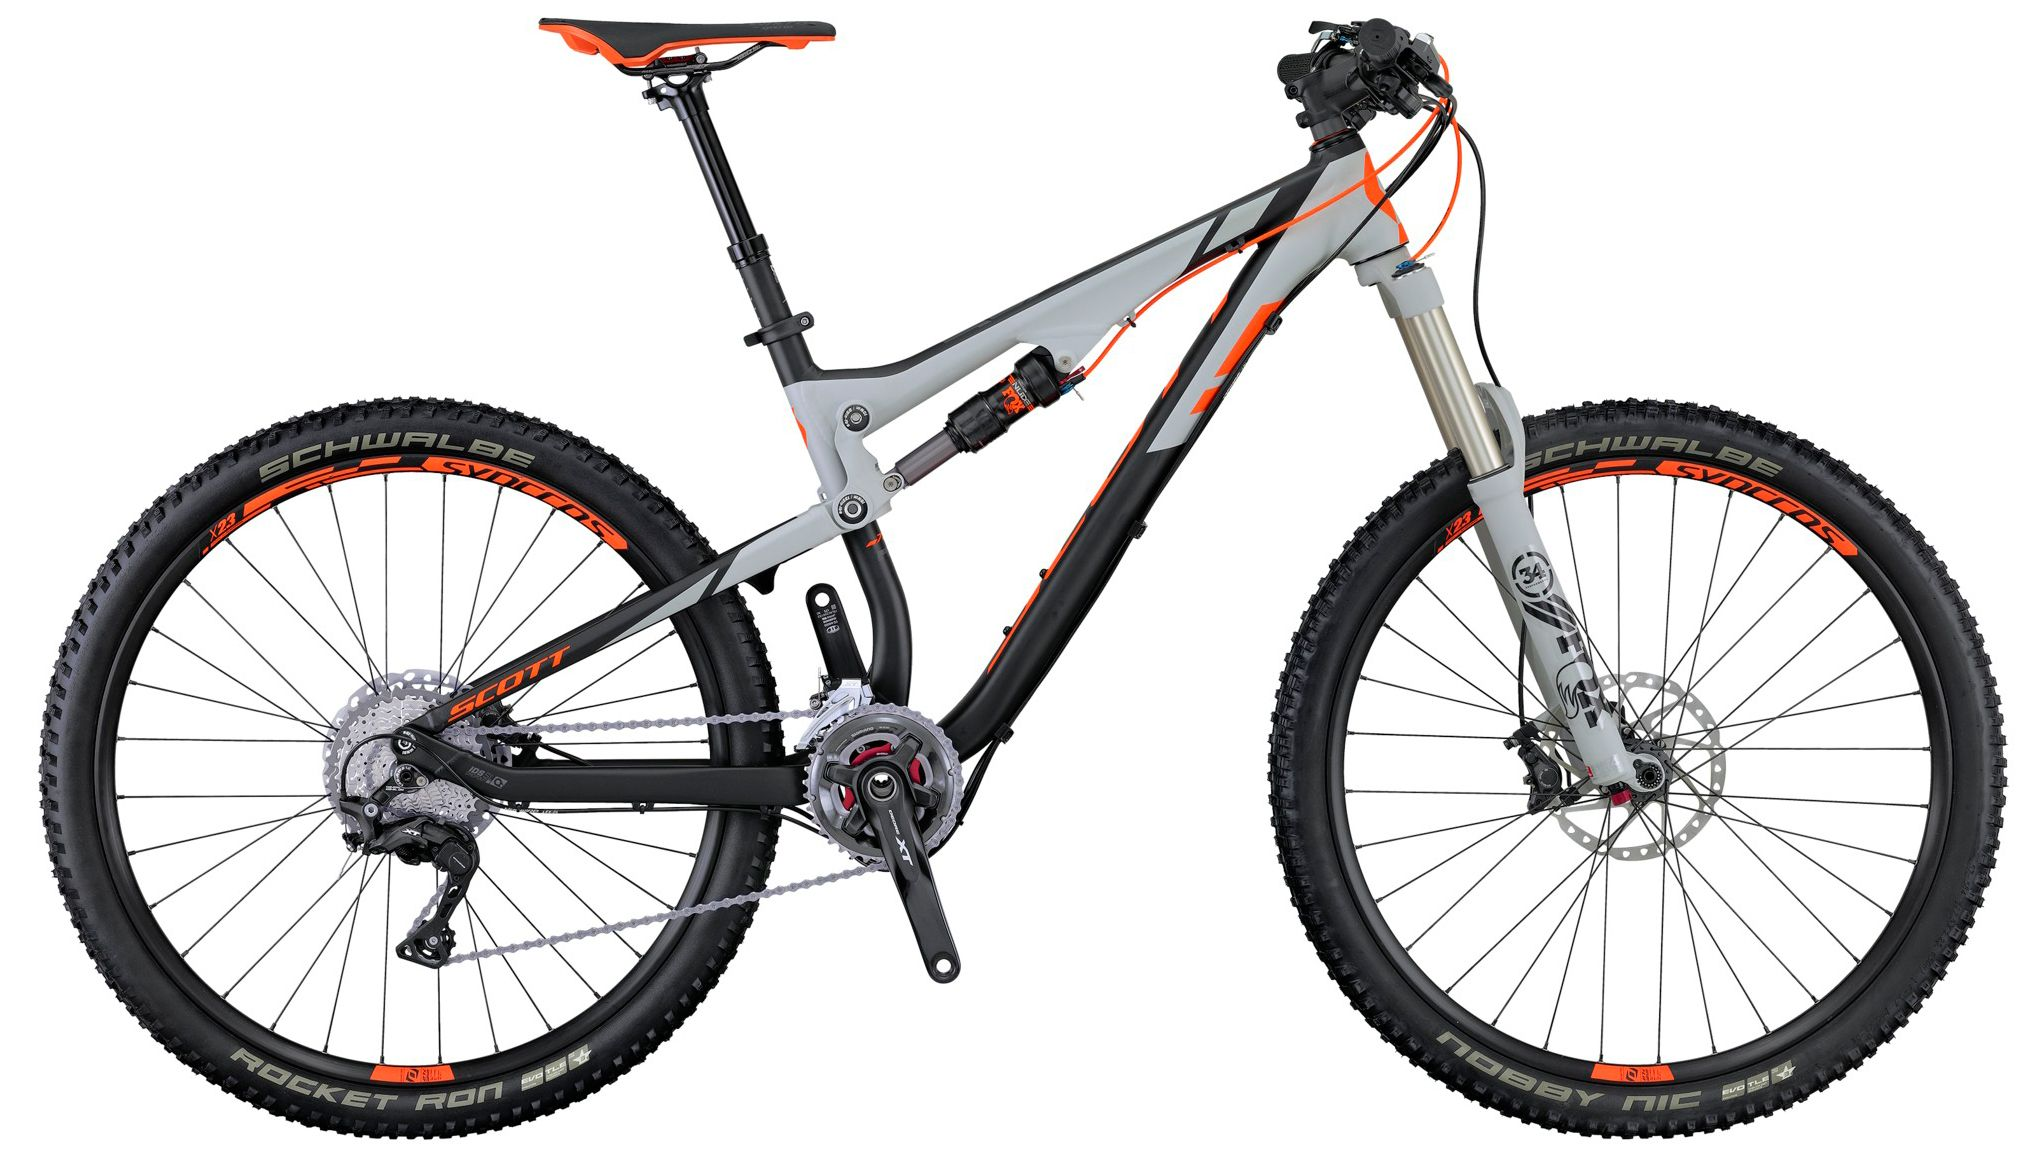 Велосипед Scott Genius 730 2016 велосипед scott genius lt 700 tuned plus 2016